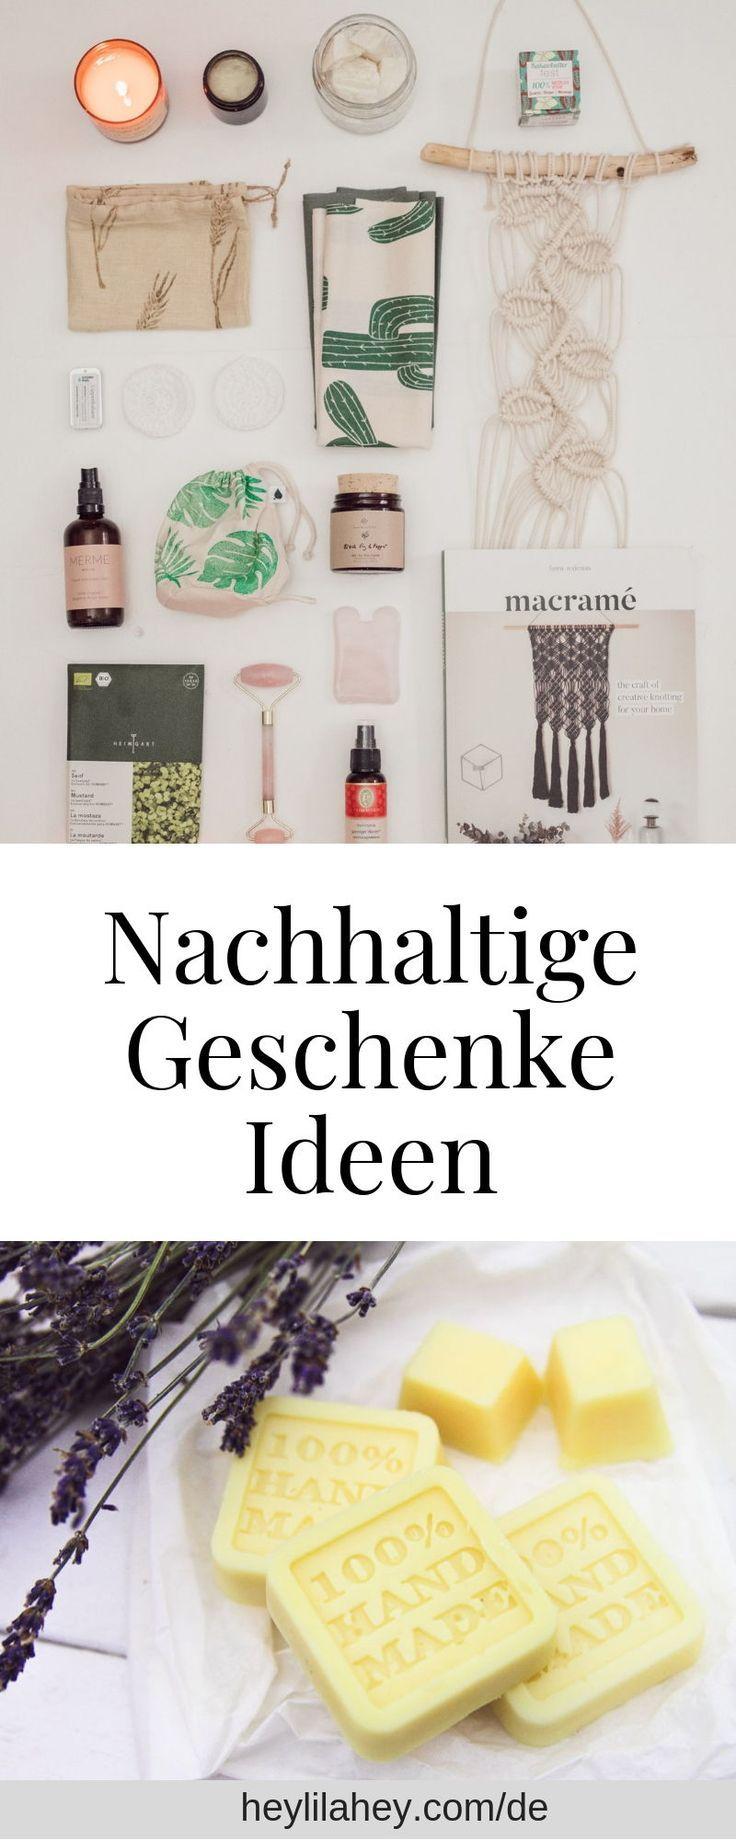 Photo of Sustainable gift ideas zero waste, natural cosmetics & charity – heylilahey.